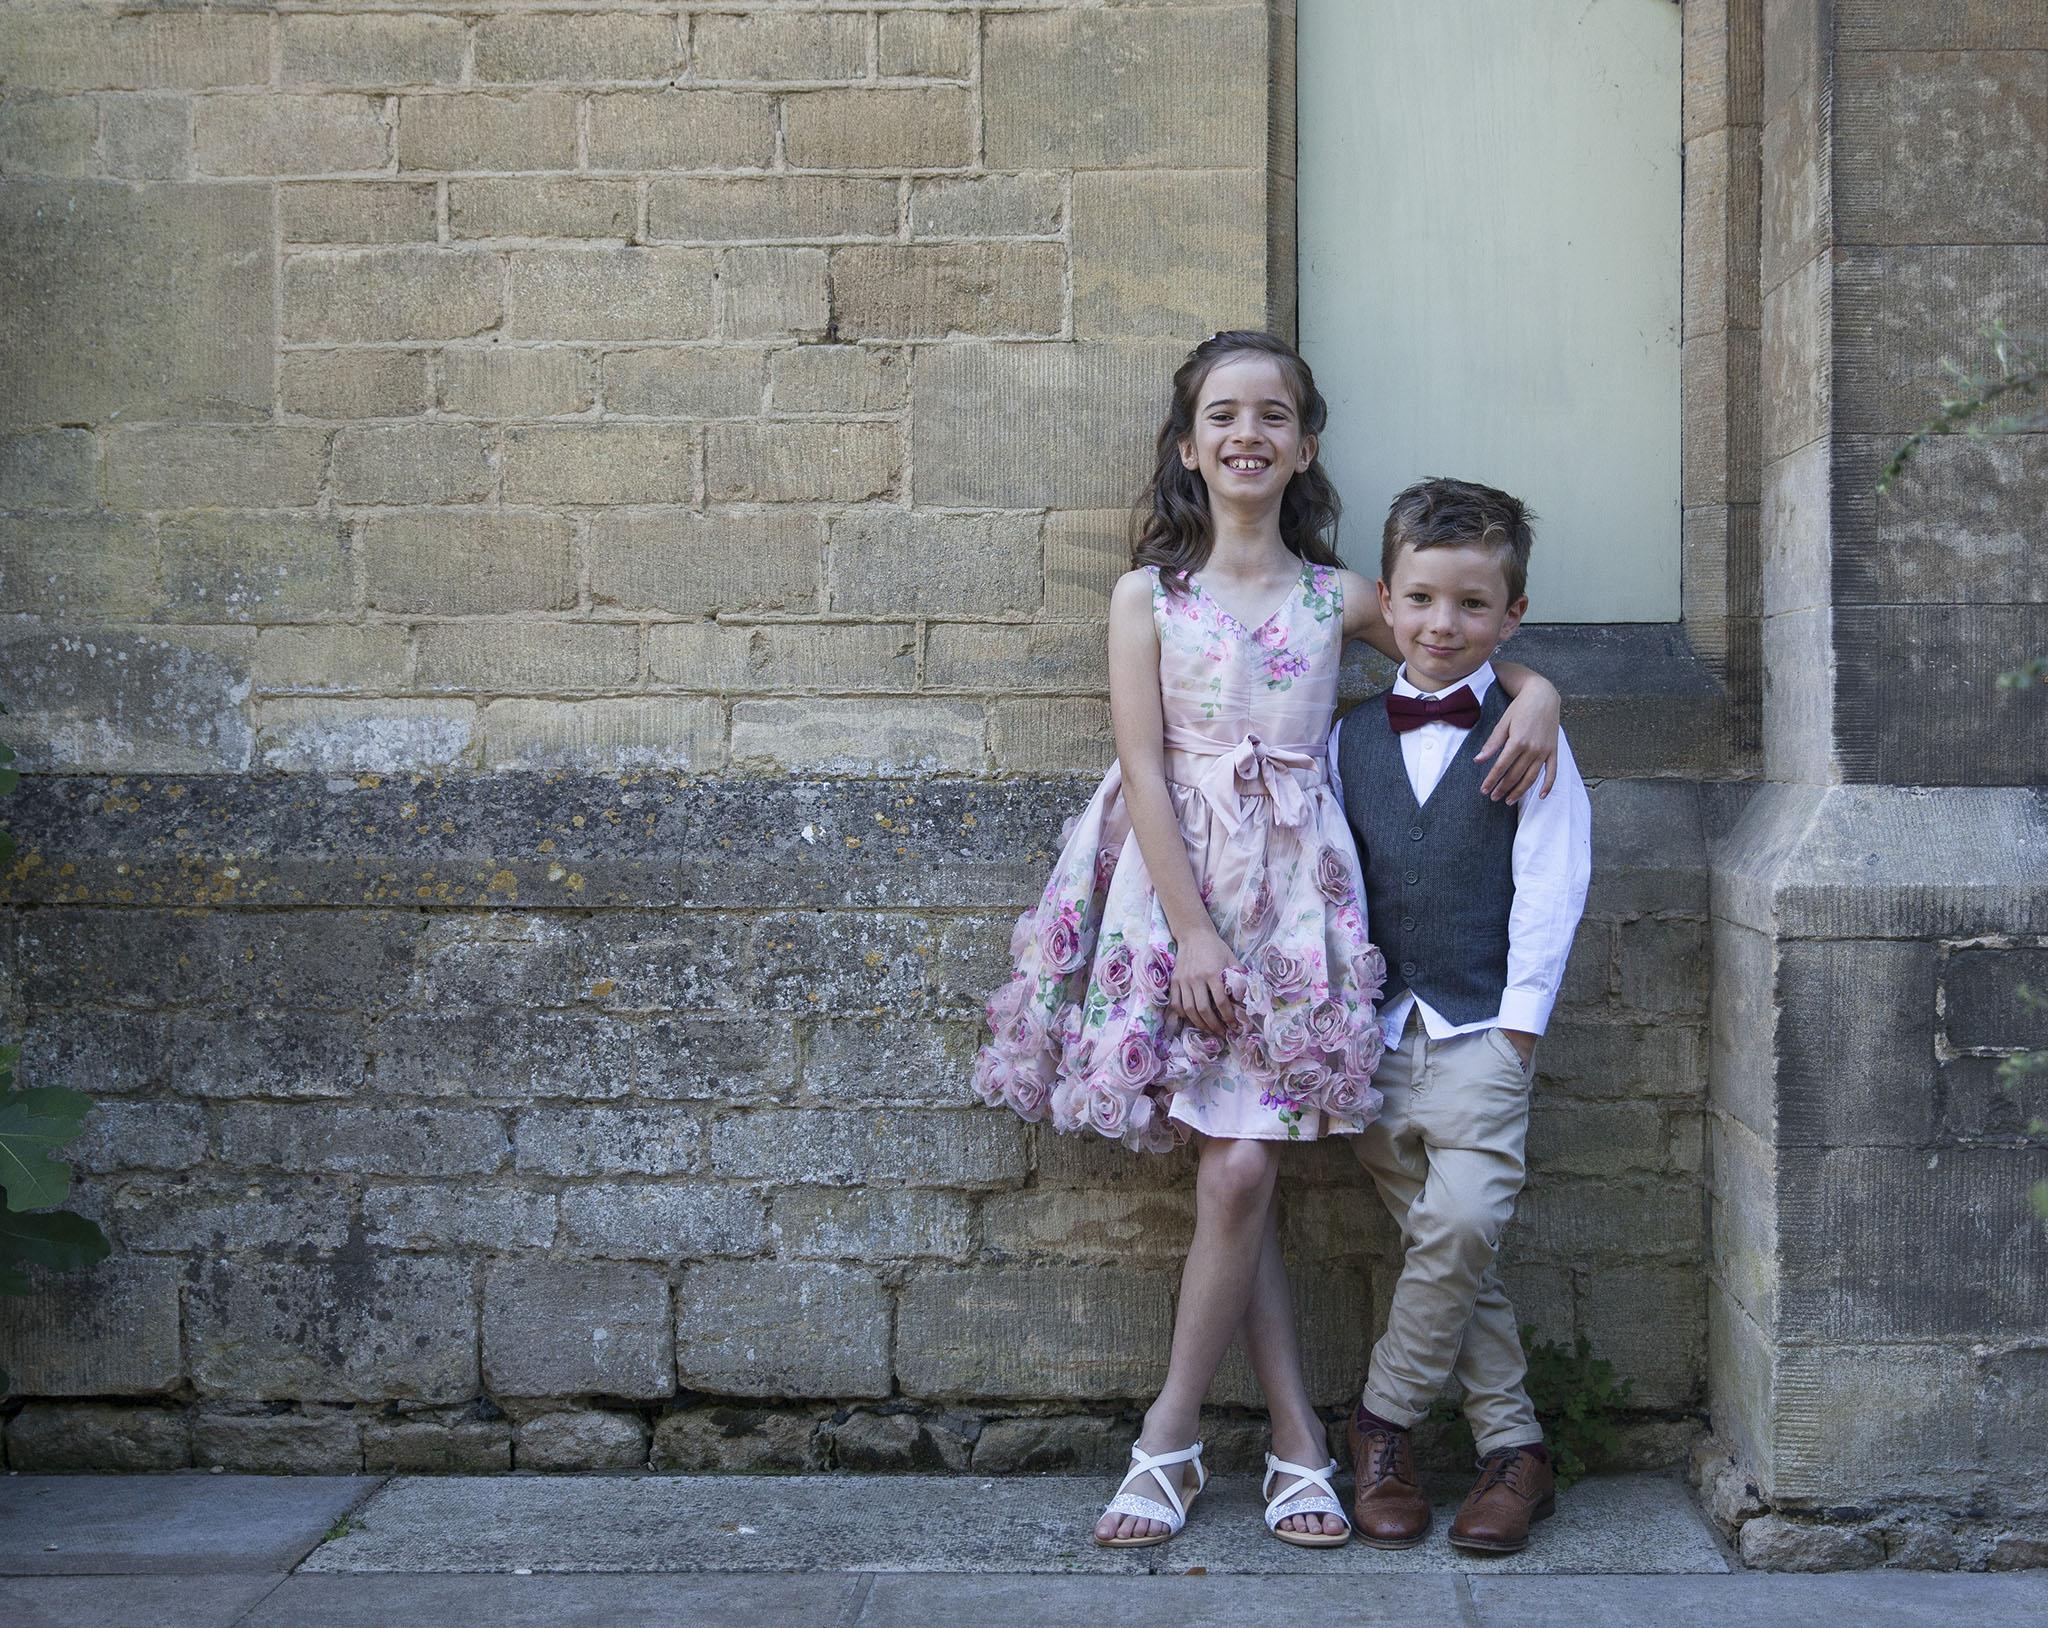 elizabethgphotography_kingslangley_hertfordshire_fineart_wedding_photography_lincolnshire_anna_simon_24.jpg